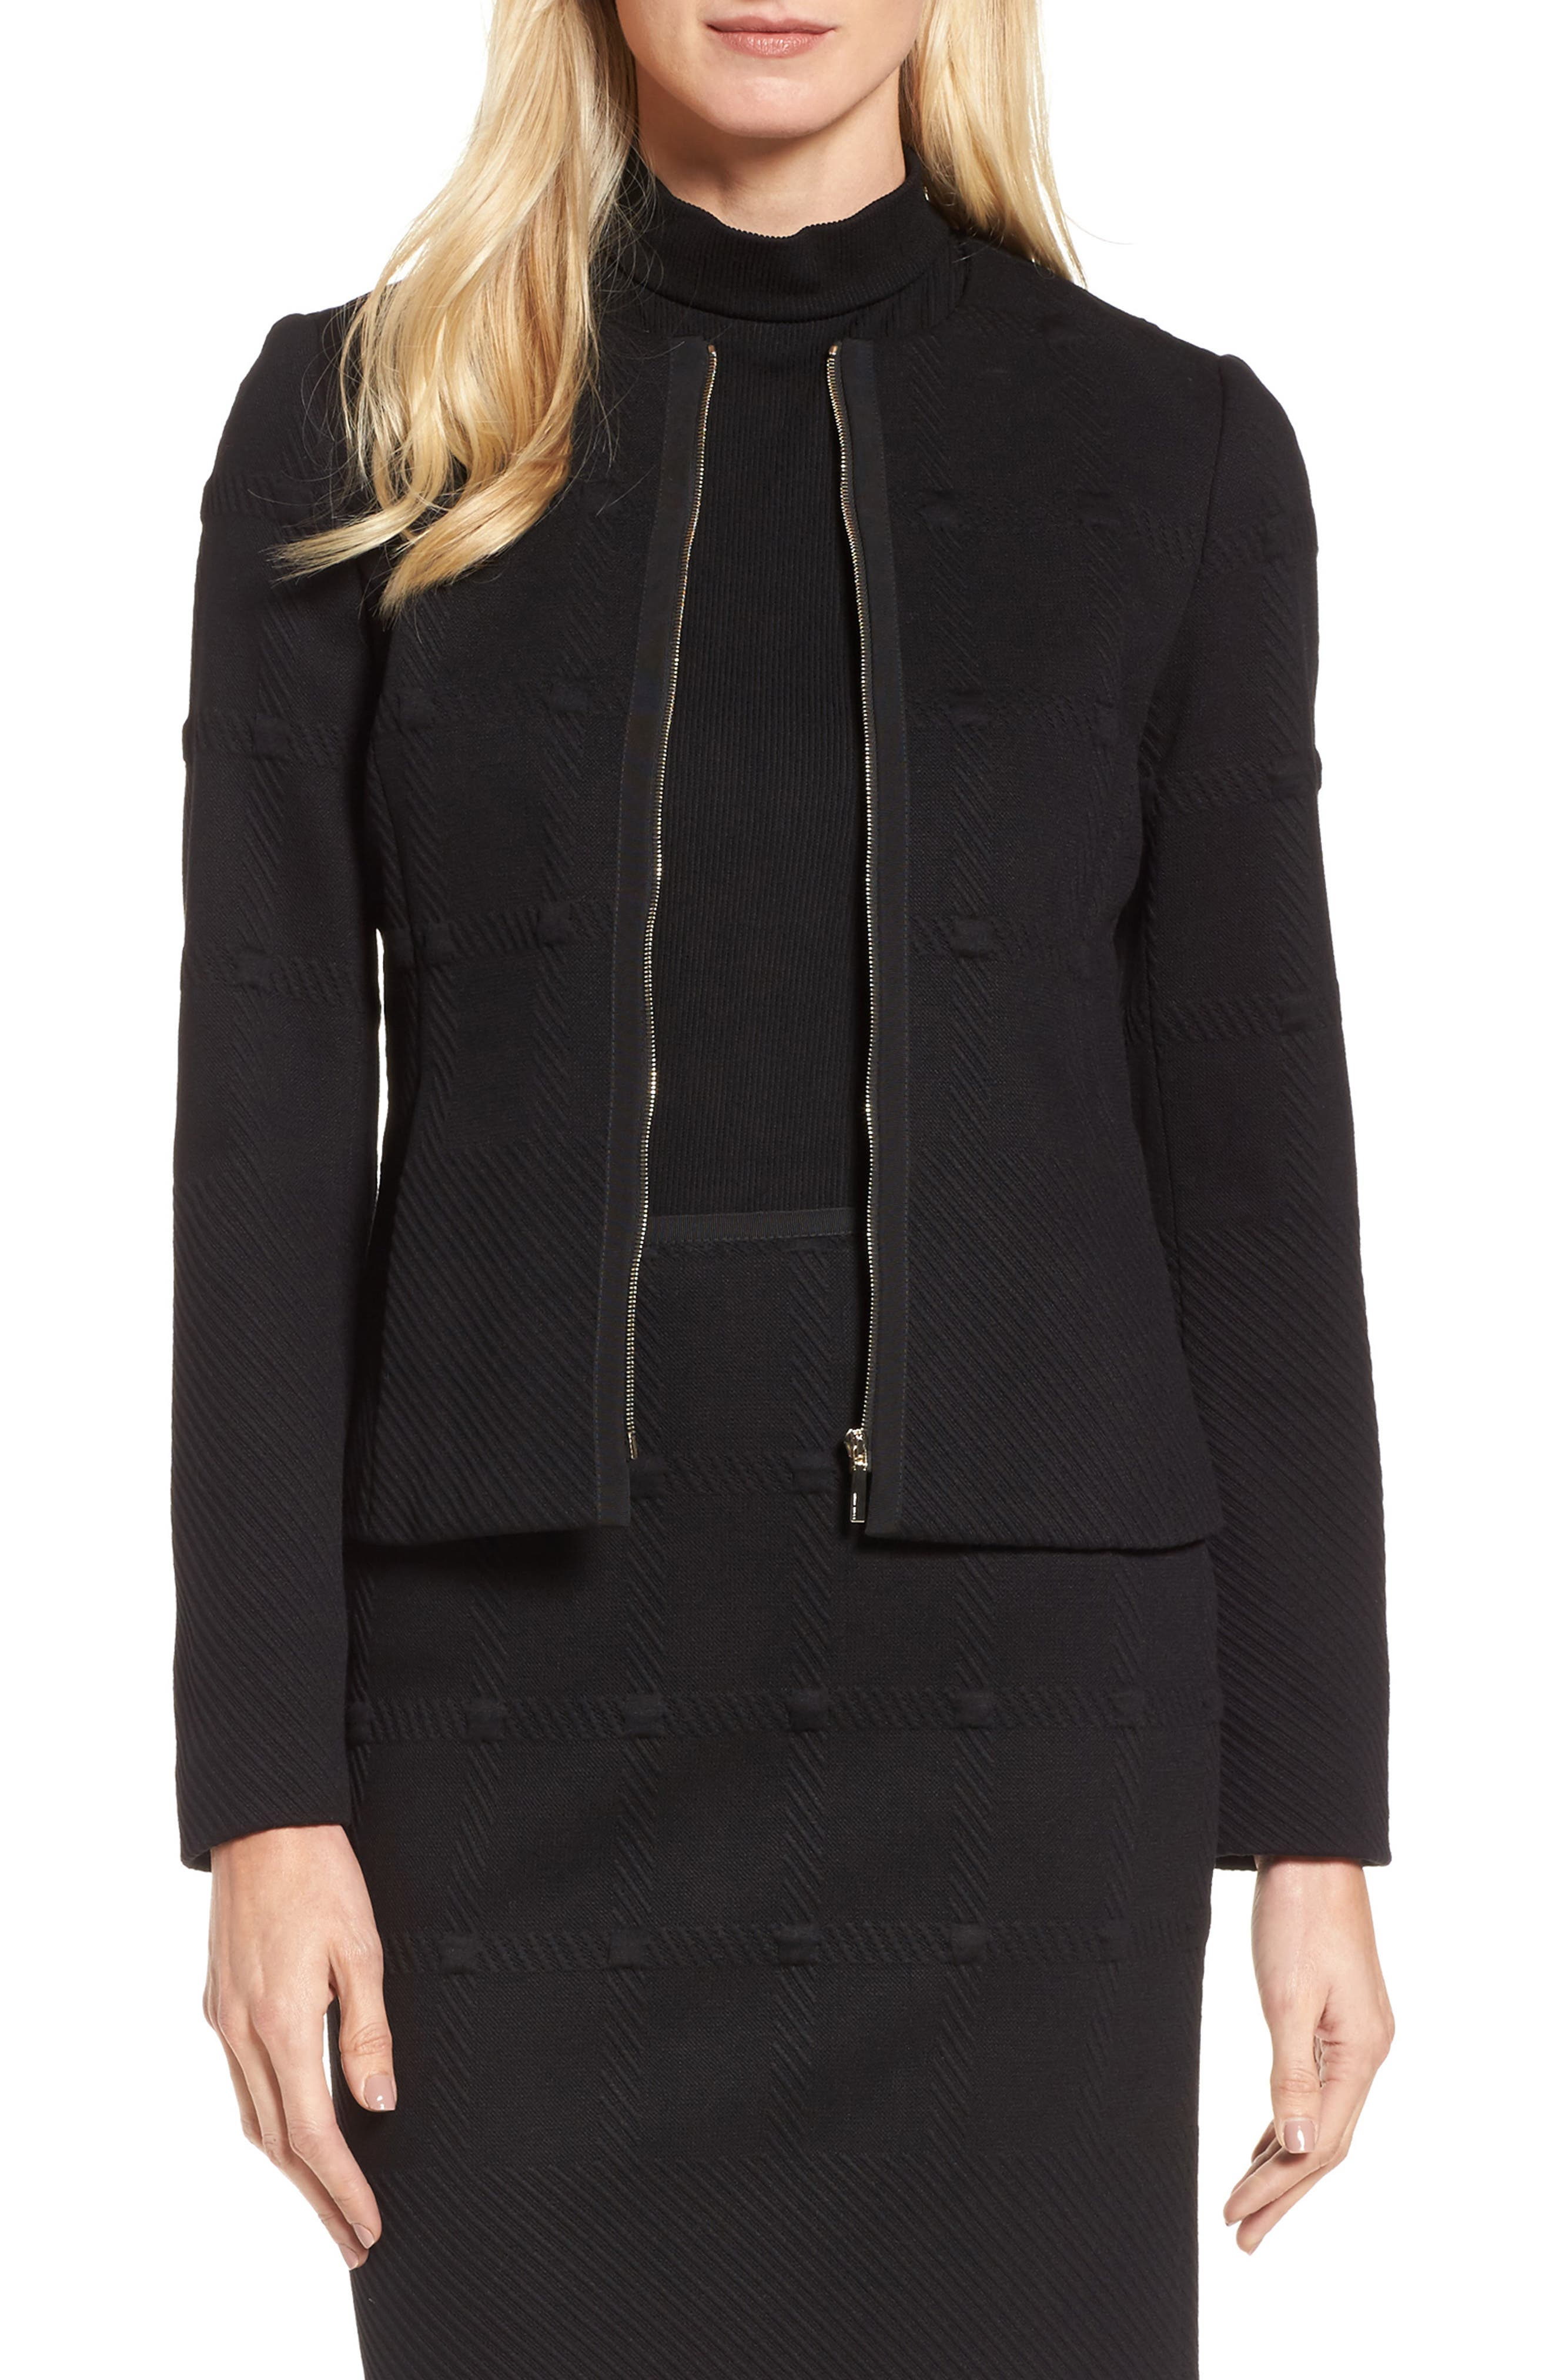 Kanelli Jacquard Jacket,                         Main,                         color, Black